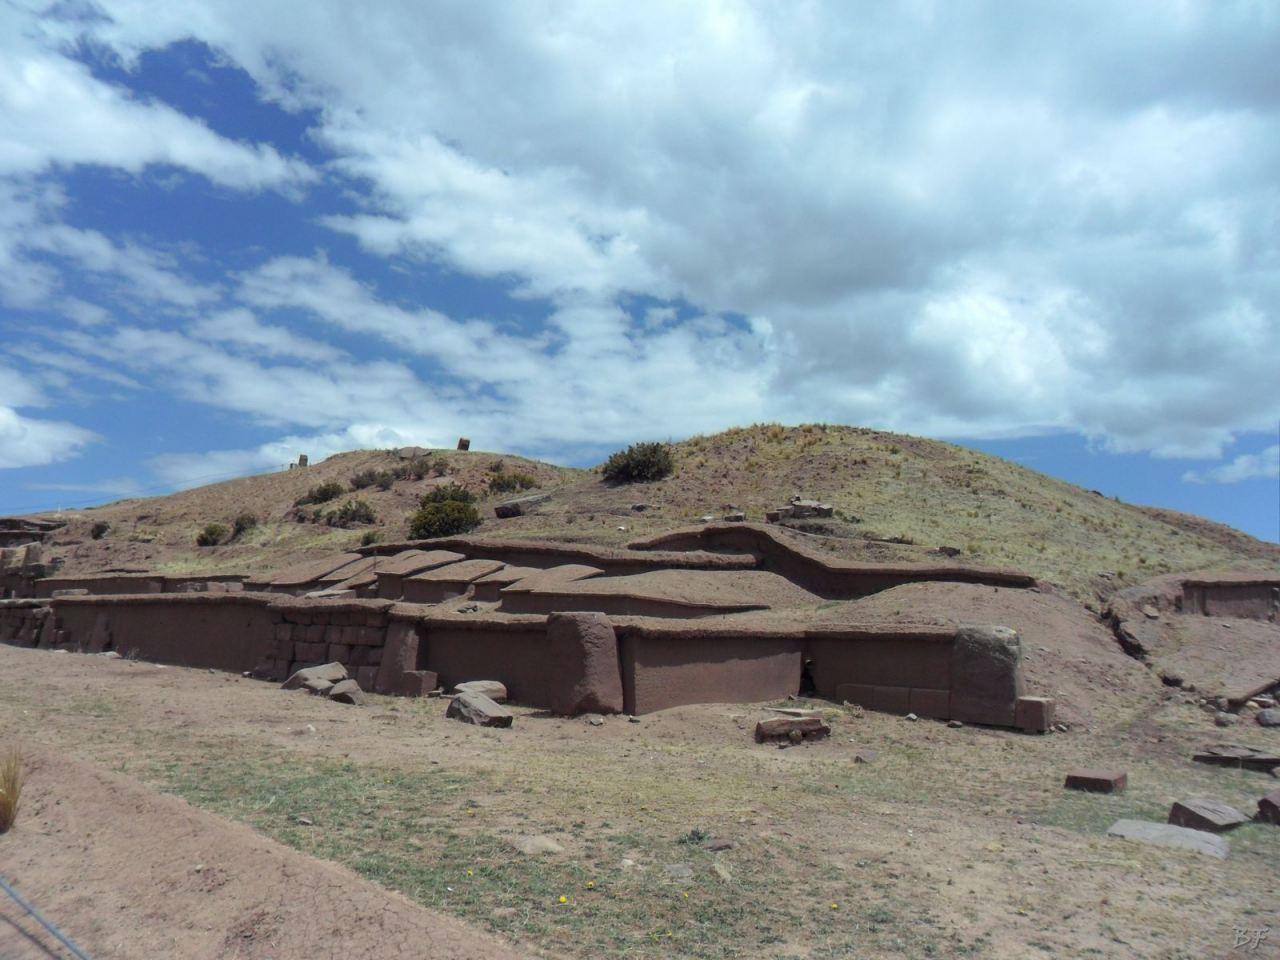 Sito-Megalitico-Piramide-Akapana-Kalasasaya-Menhir-Tiahuanaco-Bolivia-101